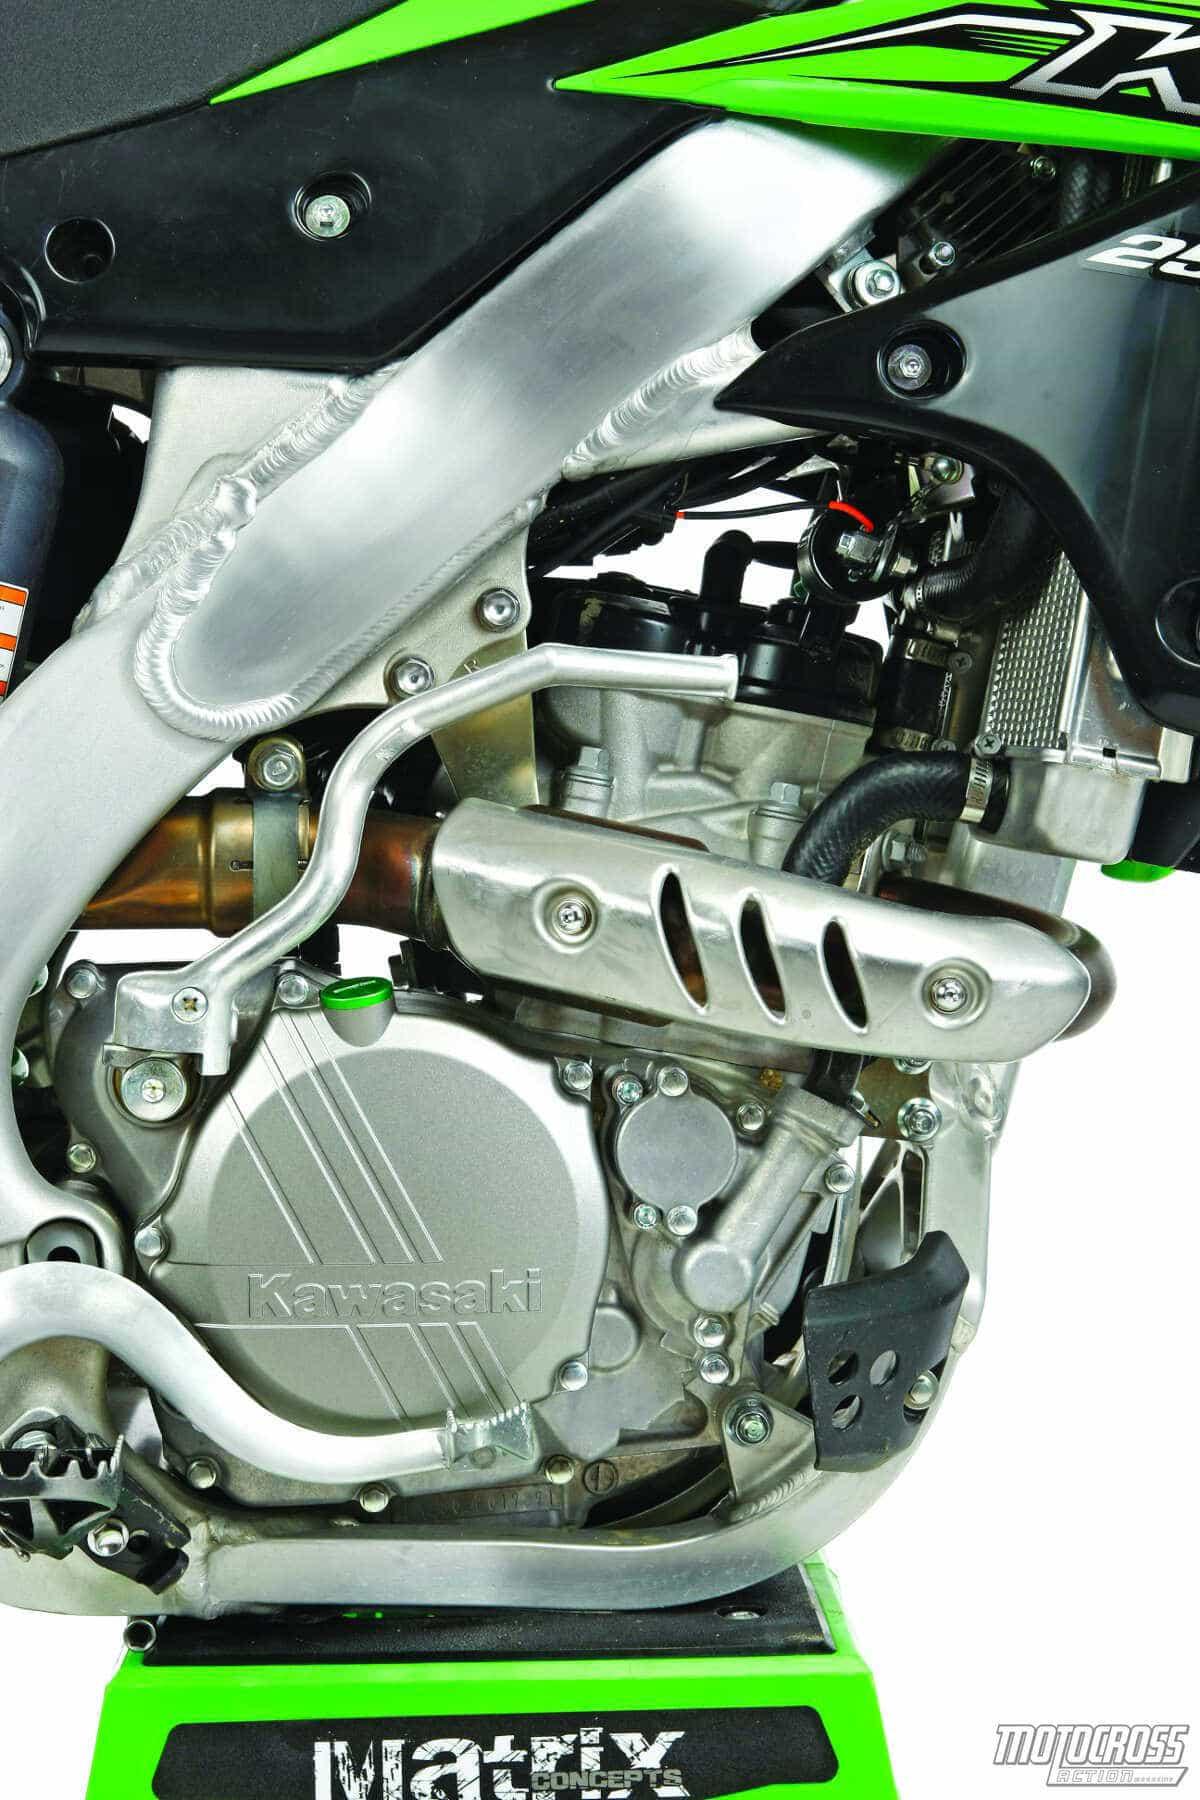 MXAS 2015 KAWASAKI KX250F MOTOCROSS TEST GREAT – Kx250f Engine Diagram